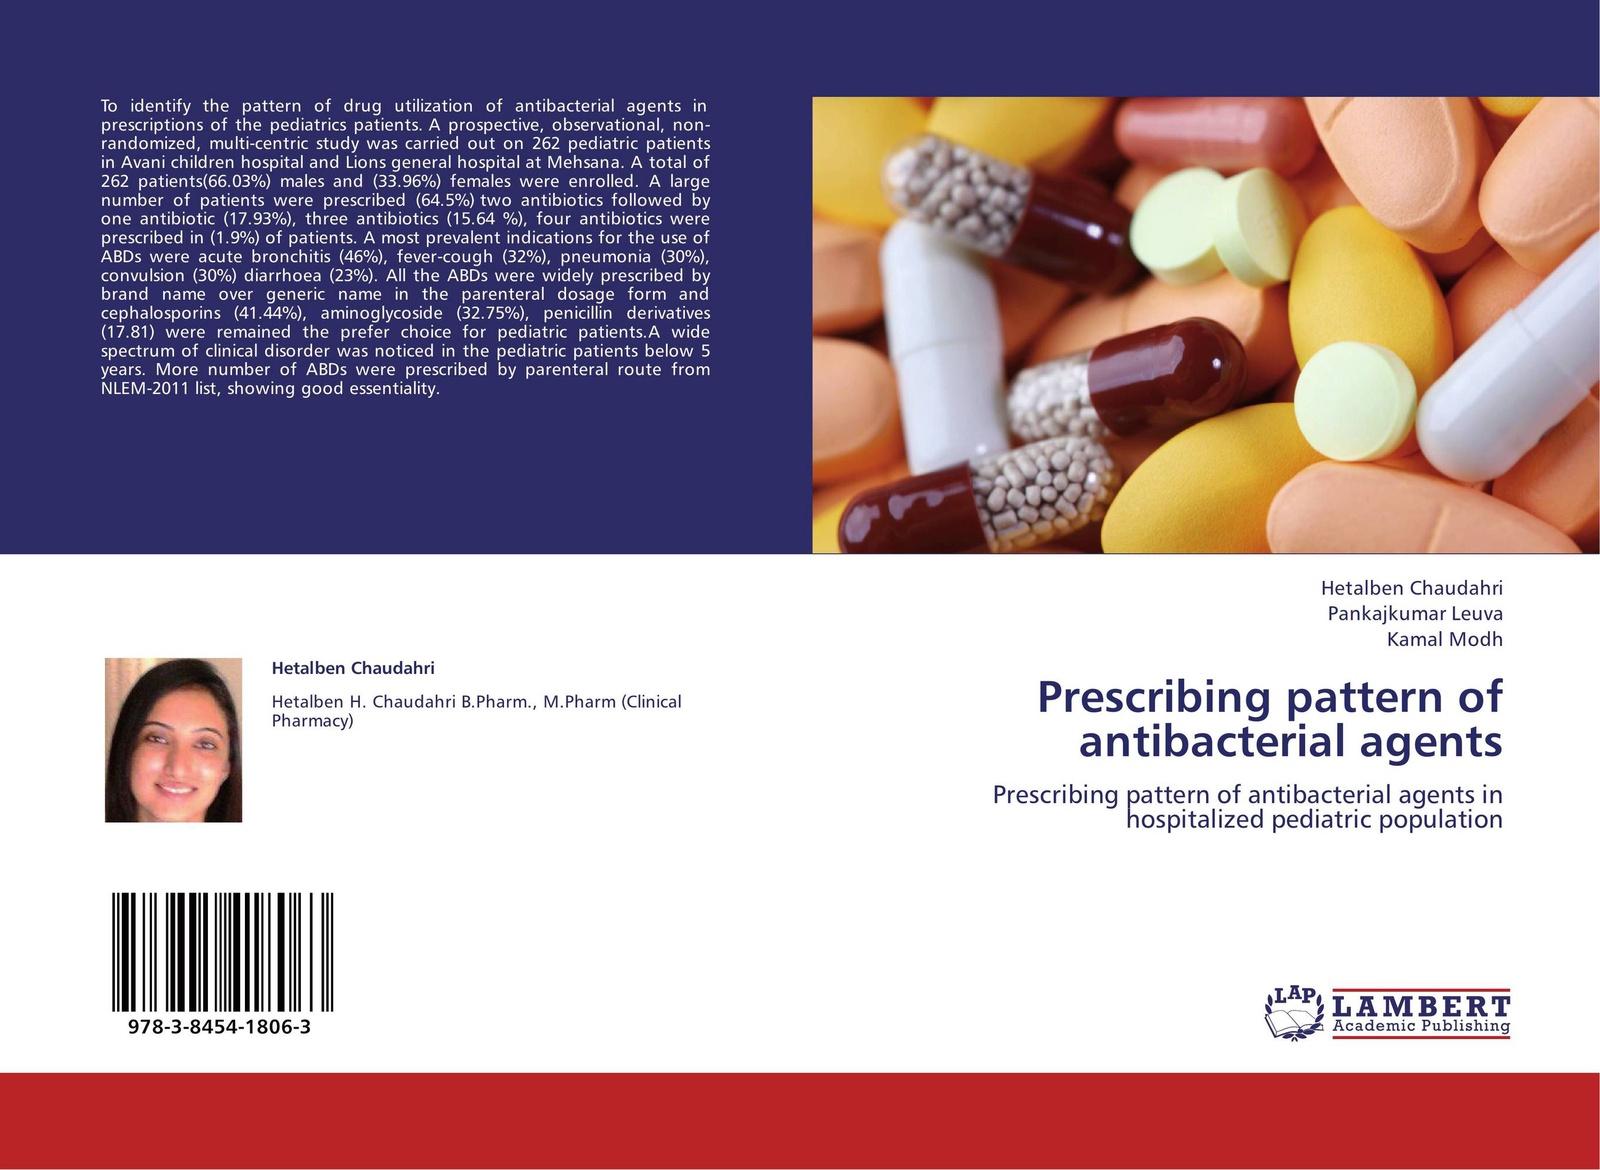 Hetalben Chaudahri,Pankajkumar Leuva and Kamal Modh Prescribing pattern of antibacterial agents handbook of antibacterial agents